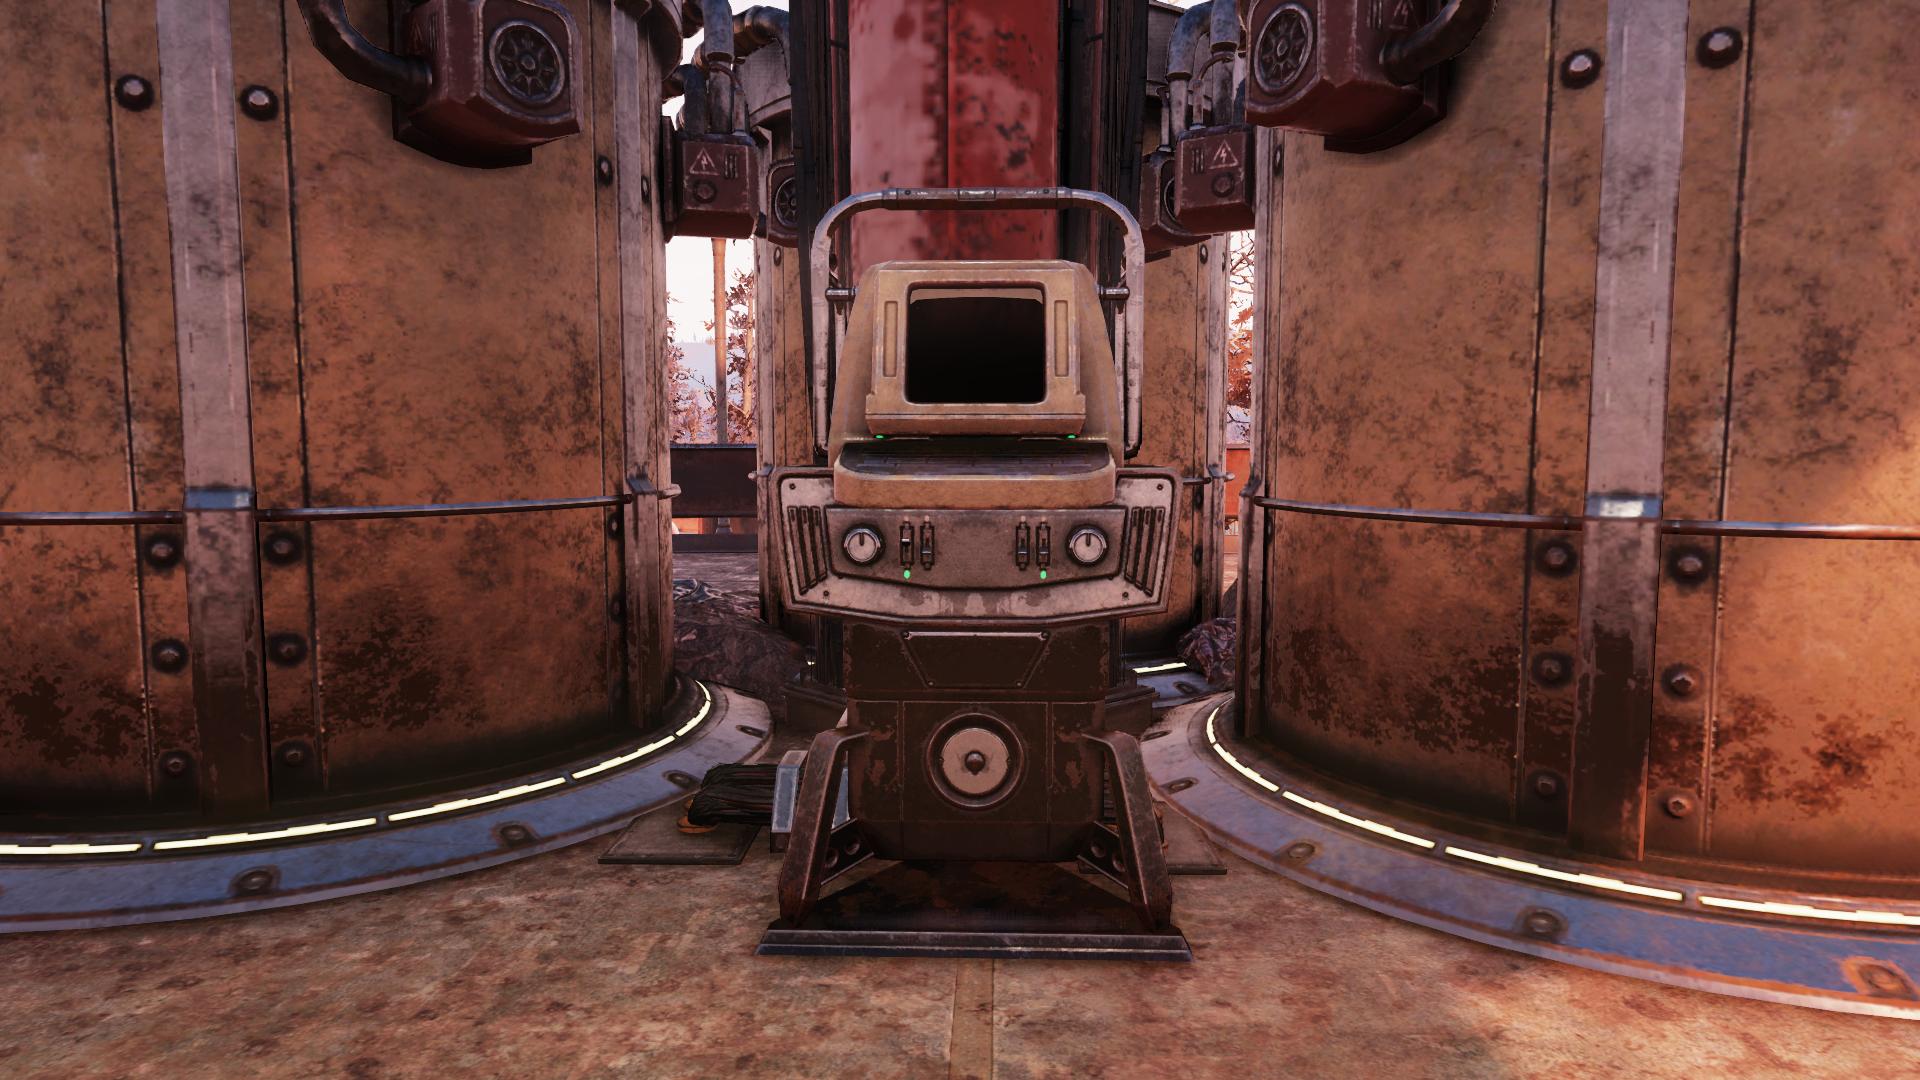 Build-A-Bot station